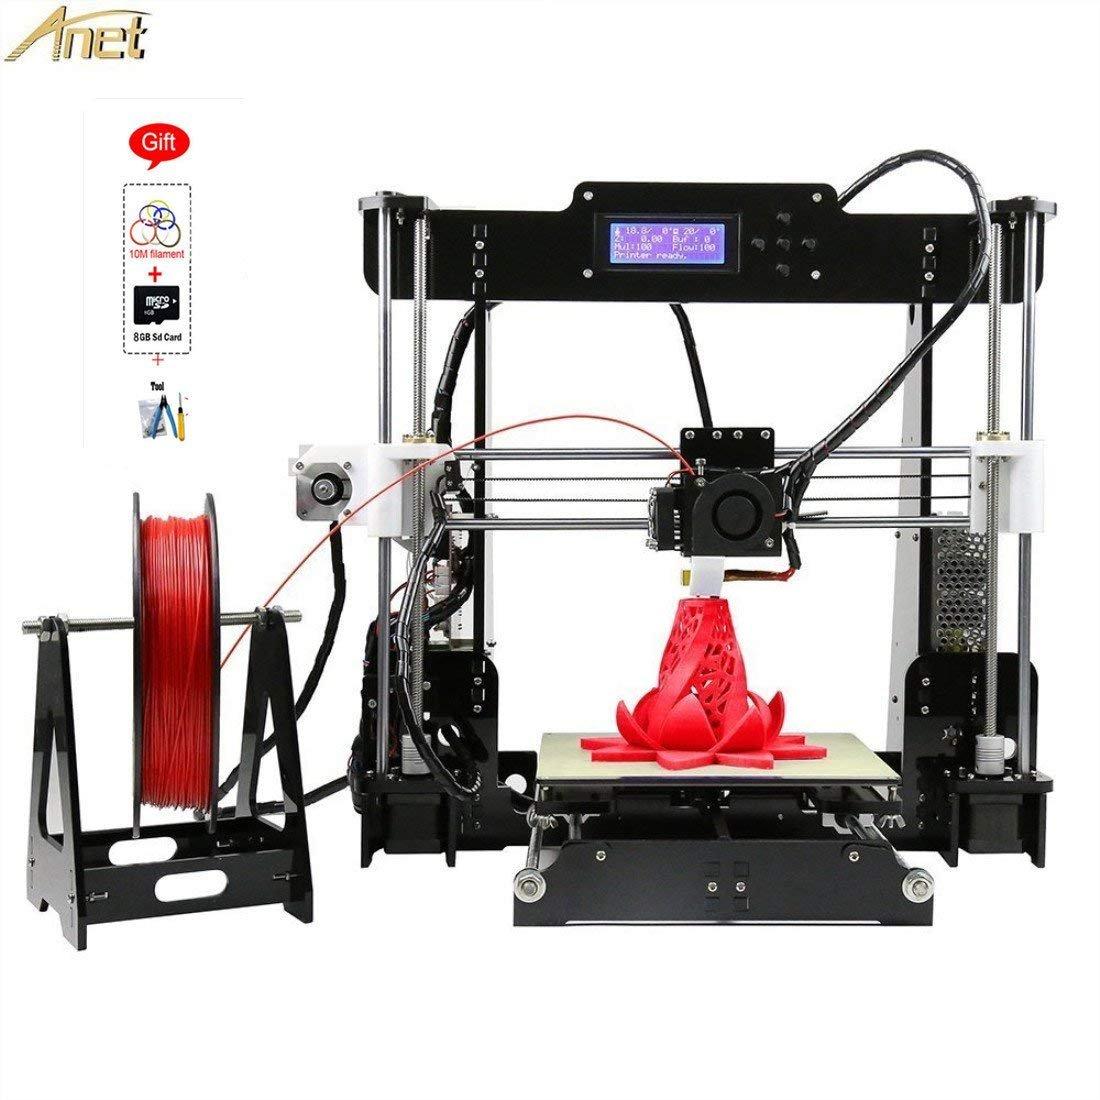 Anet A8 impresora 3d soporte Kit de bricolaje material de ...